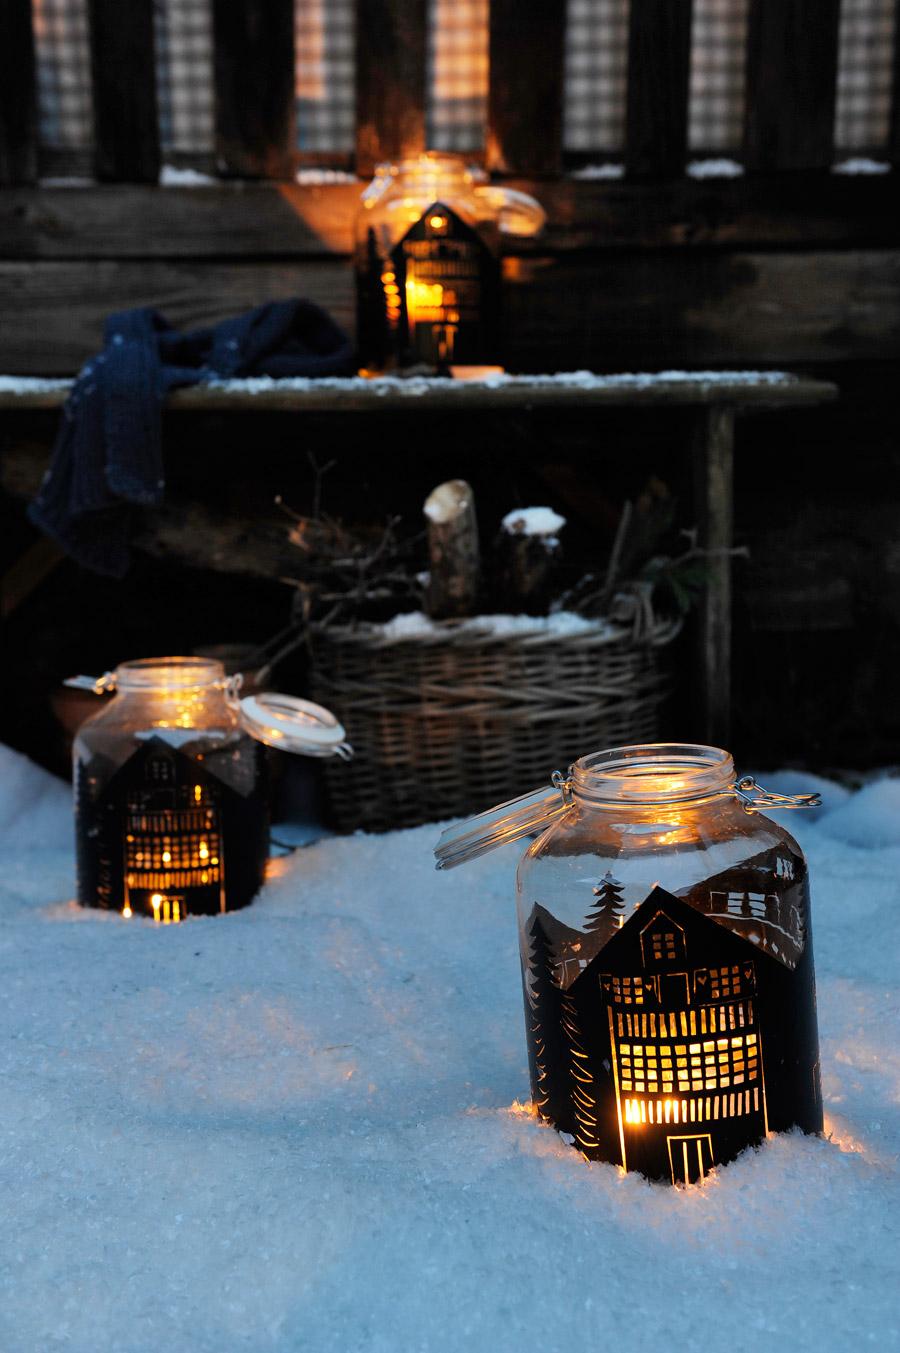 diy-silhouette-lantern-mason-jar-snow.jpg